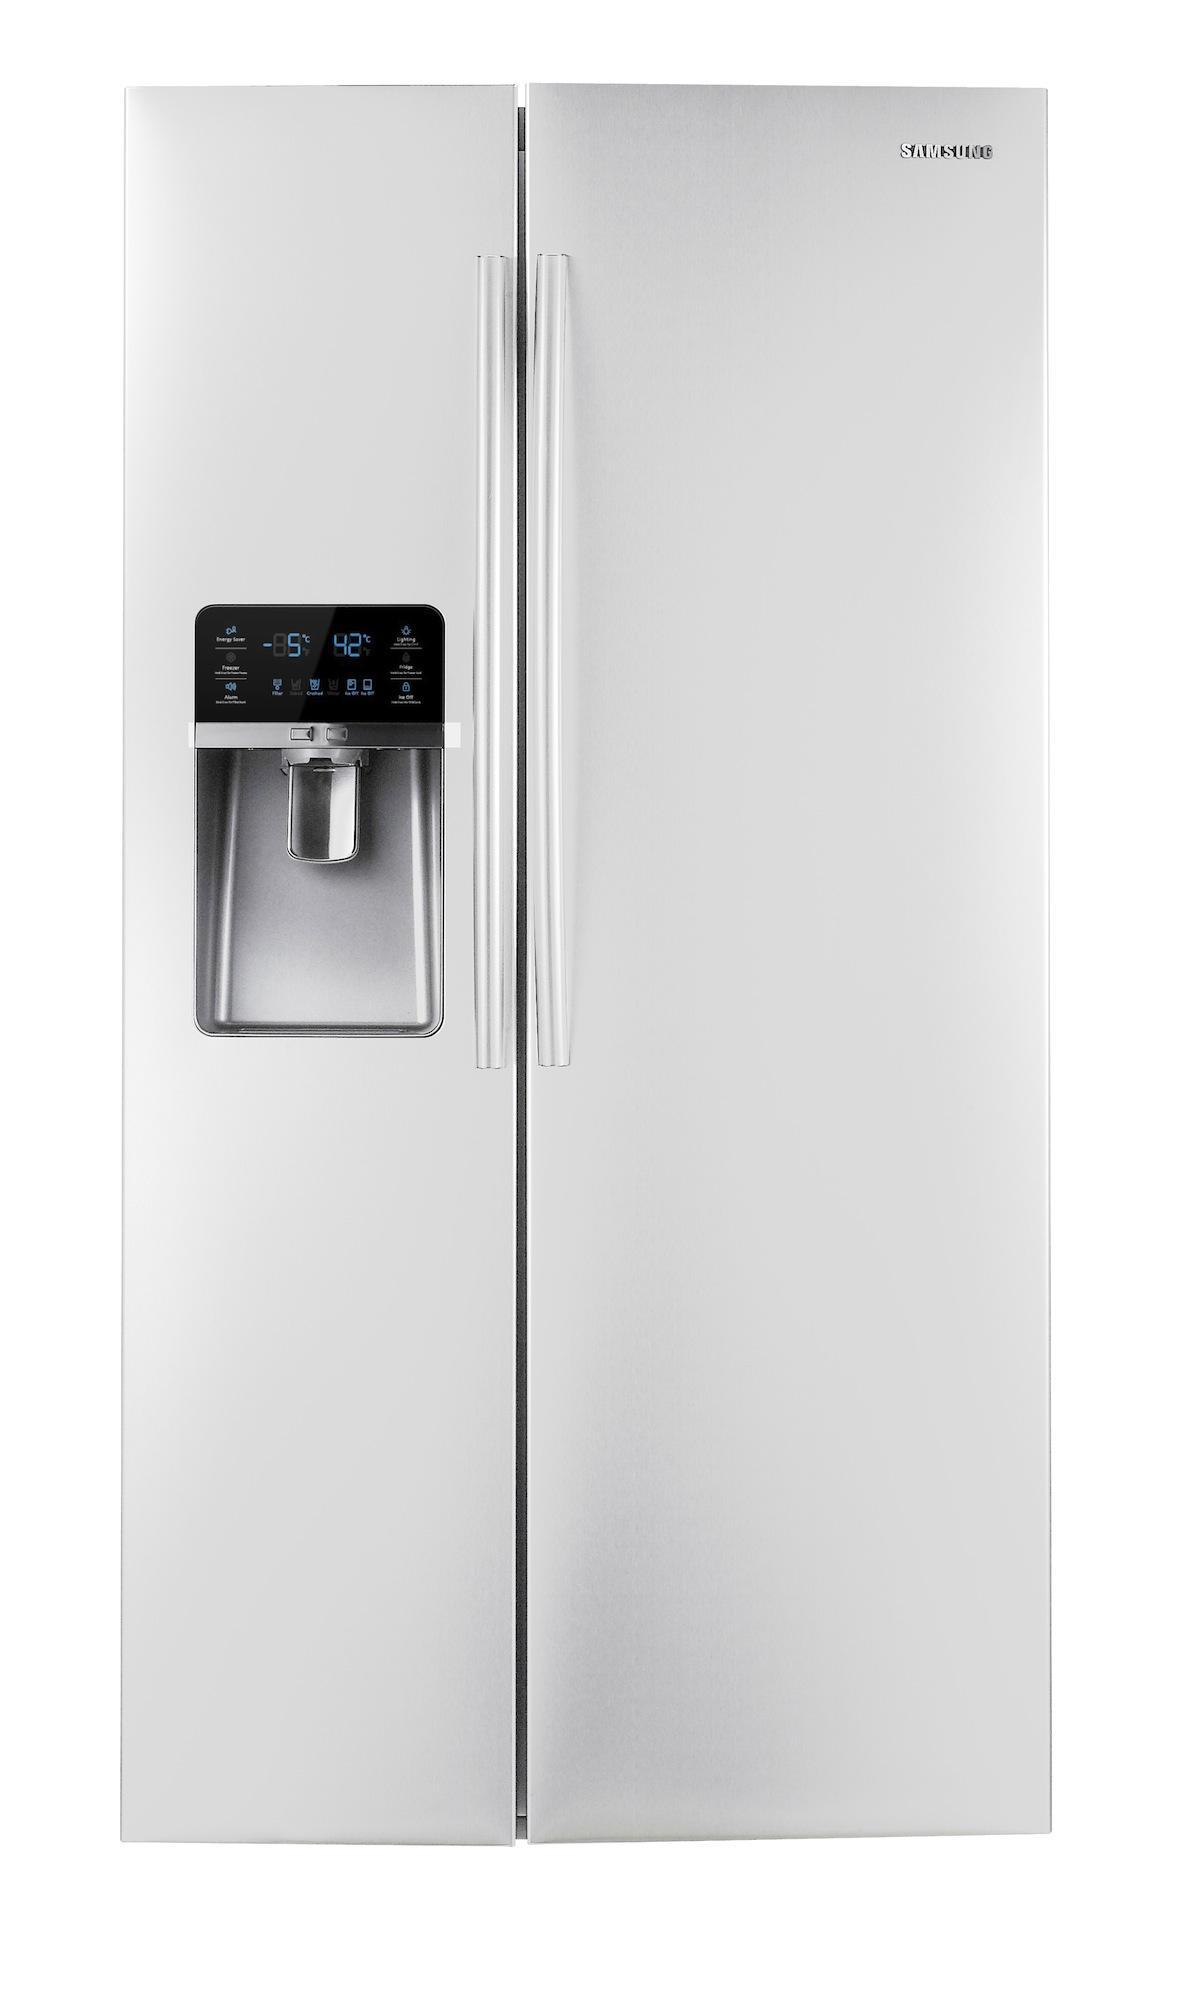 Samsung Rsg307aars 29 6 Cu Ft Side By Side Refrigerator